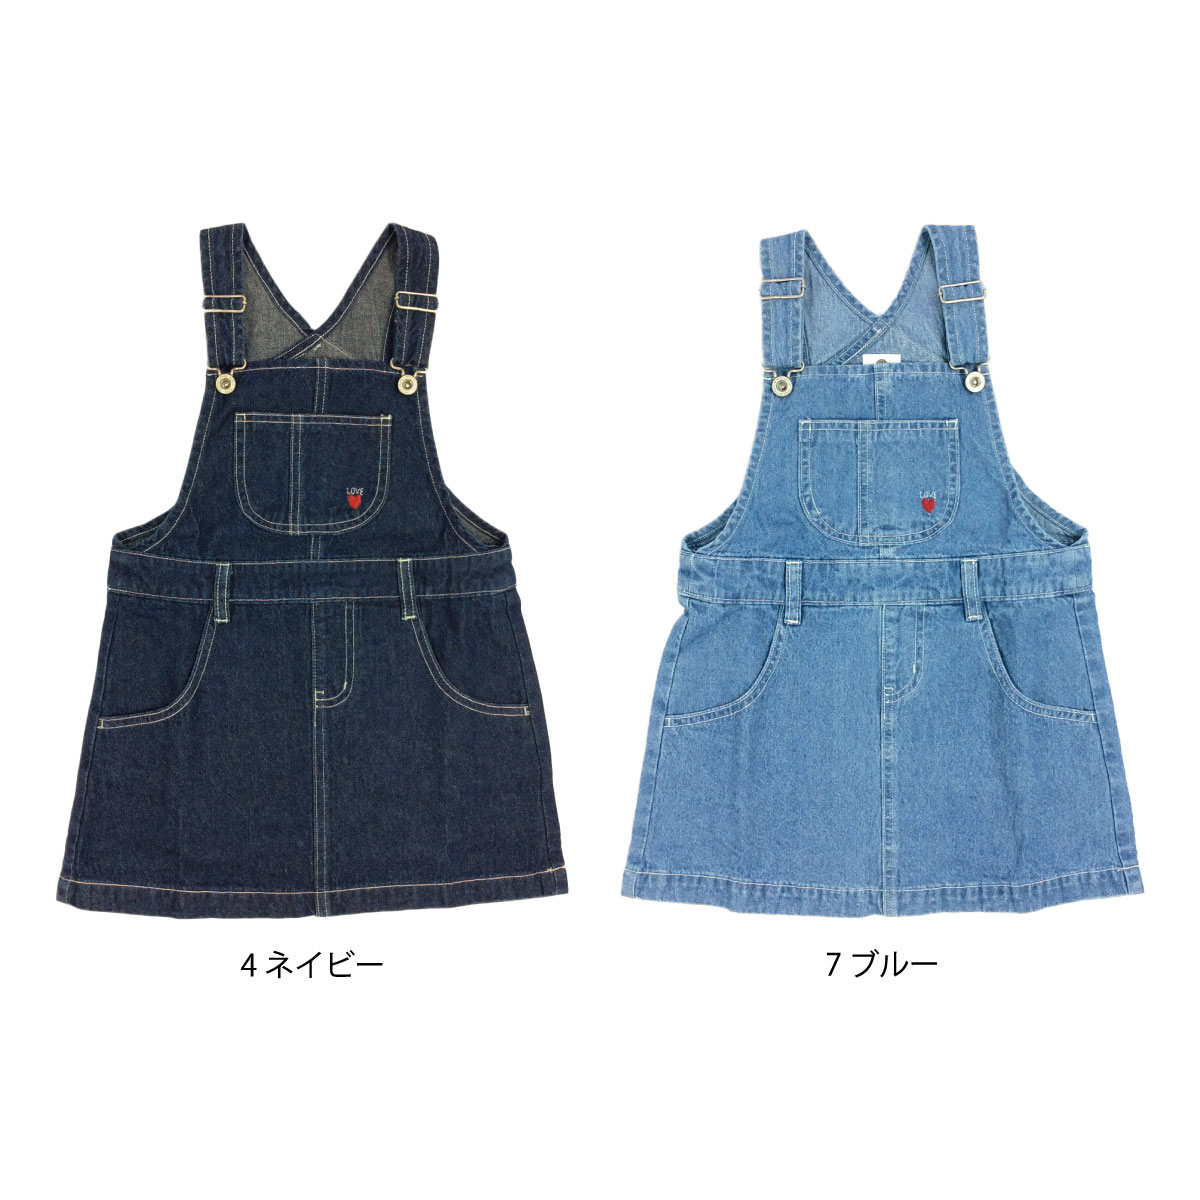 【SiShuNon/SKAPE】デニムジャンスカ 女の子 キッズ スカート ジャンパースカート デニム ハート ワンポイント 刺繍 ワンピース